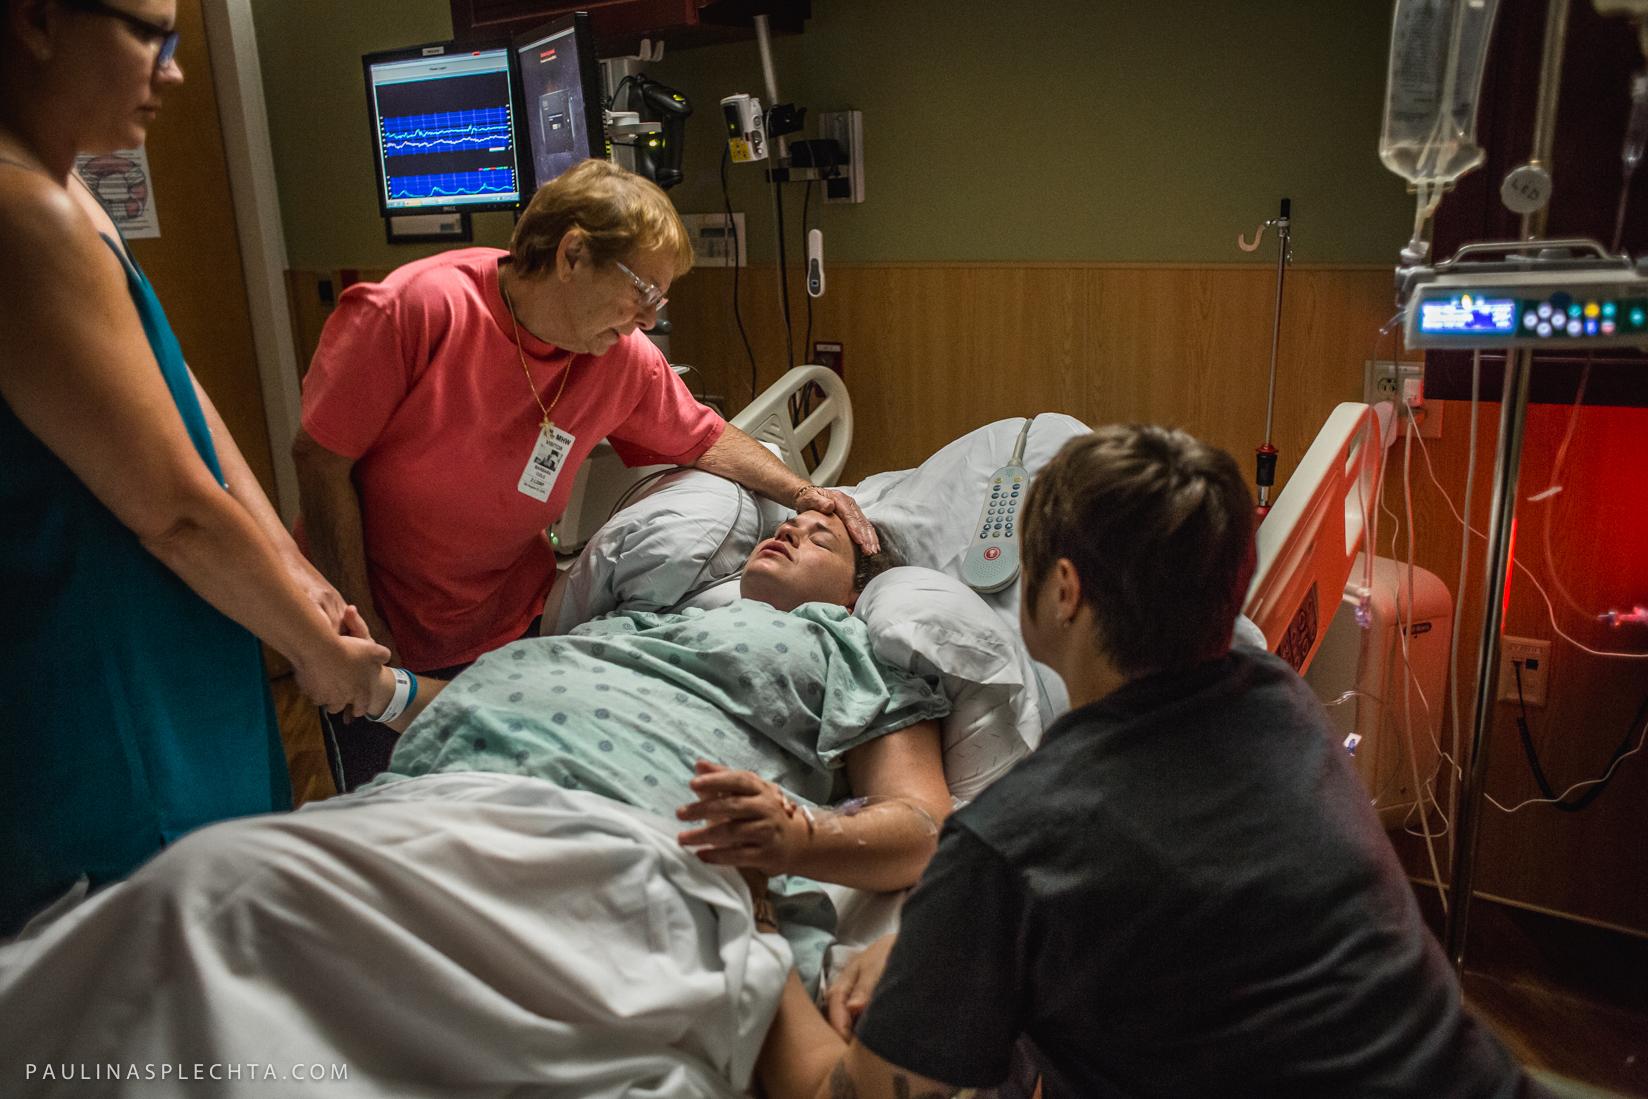 greenpath-baby-zika-babycenter-center-birth-photographer-miramar-go-into-labor-miami-boca-shelter-regional-pediatrician-broward-36-weeks-pregnant-haiti-hurricane-matthew-3.jpg